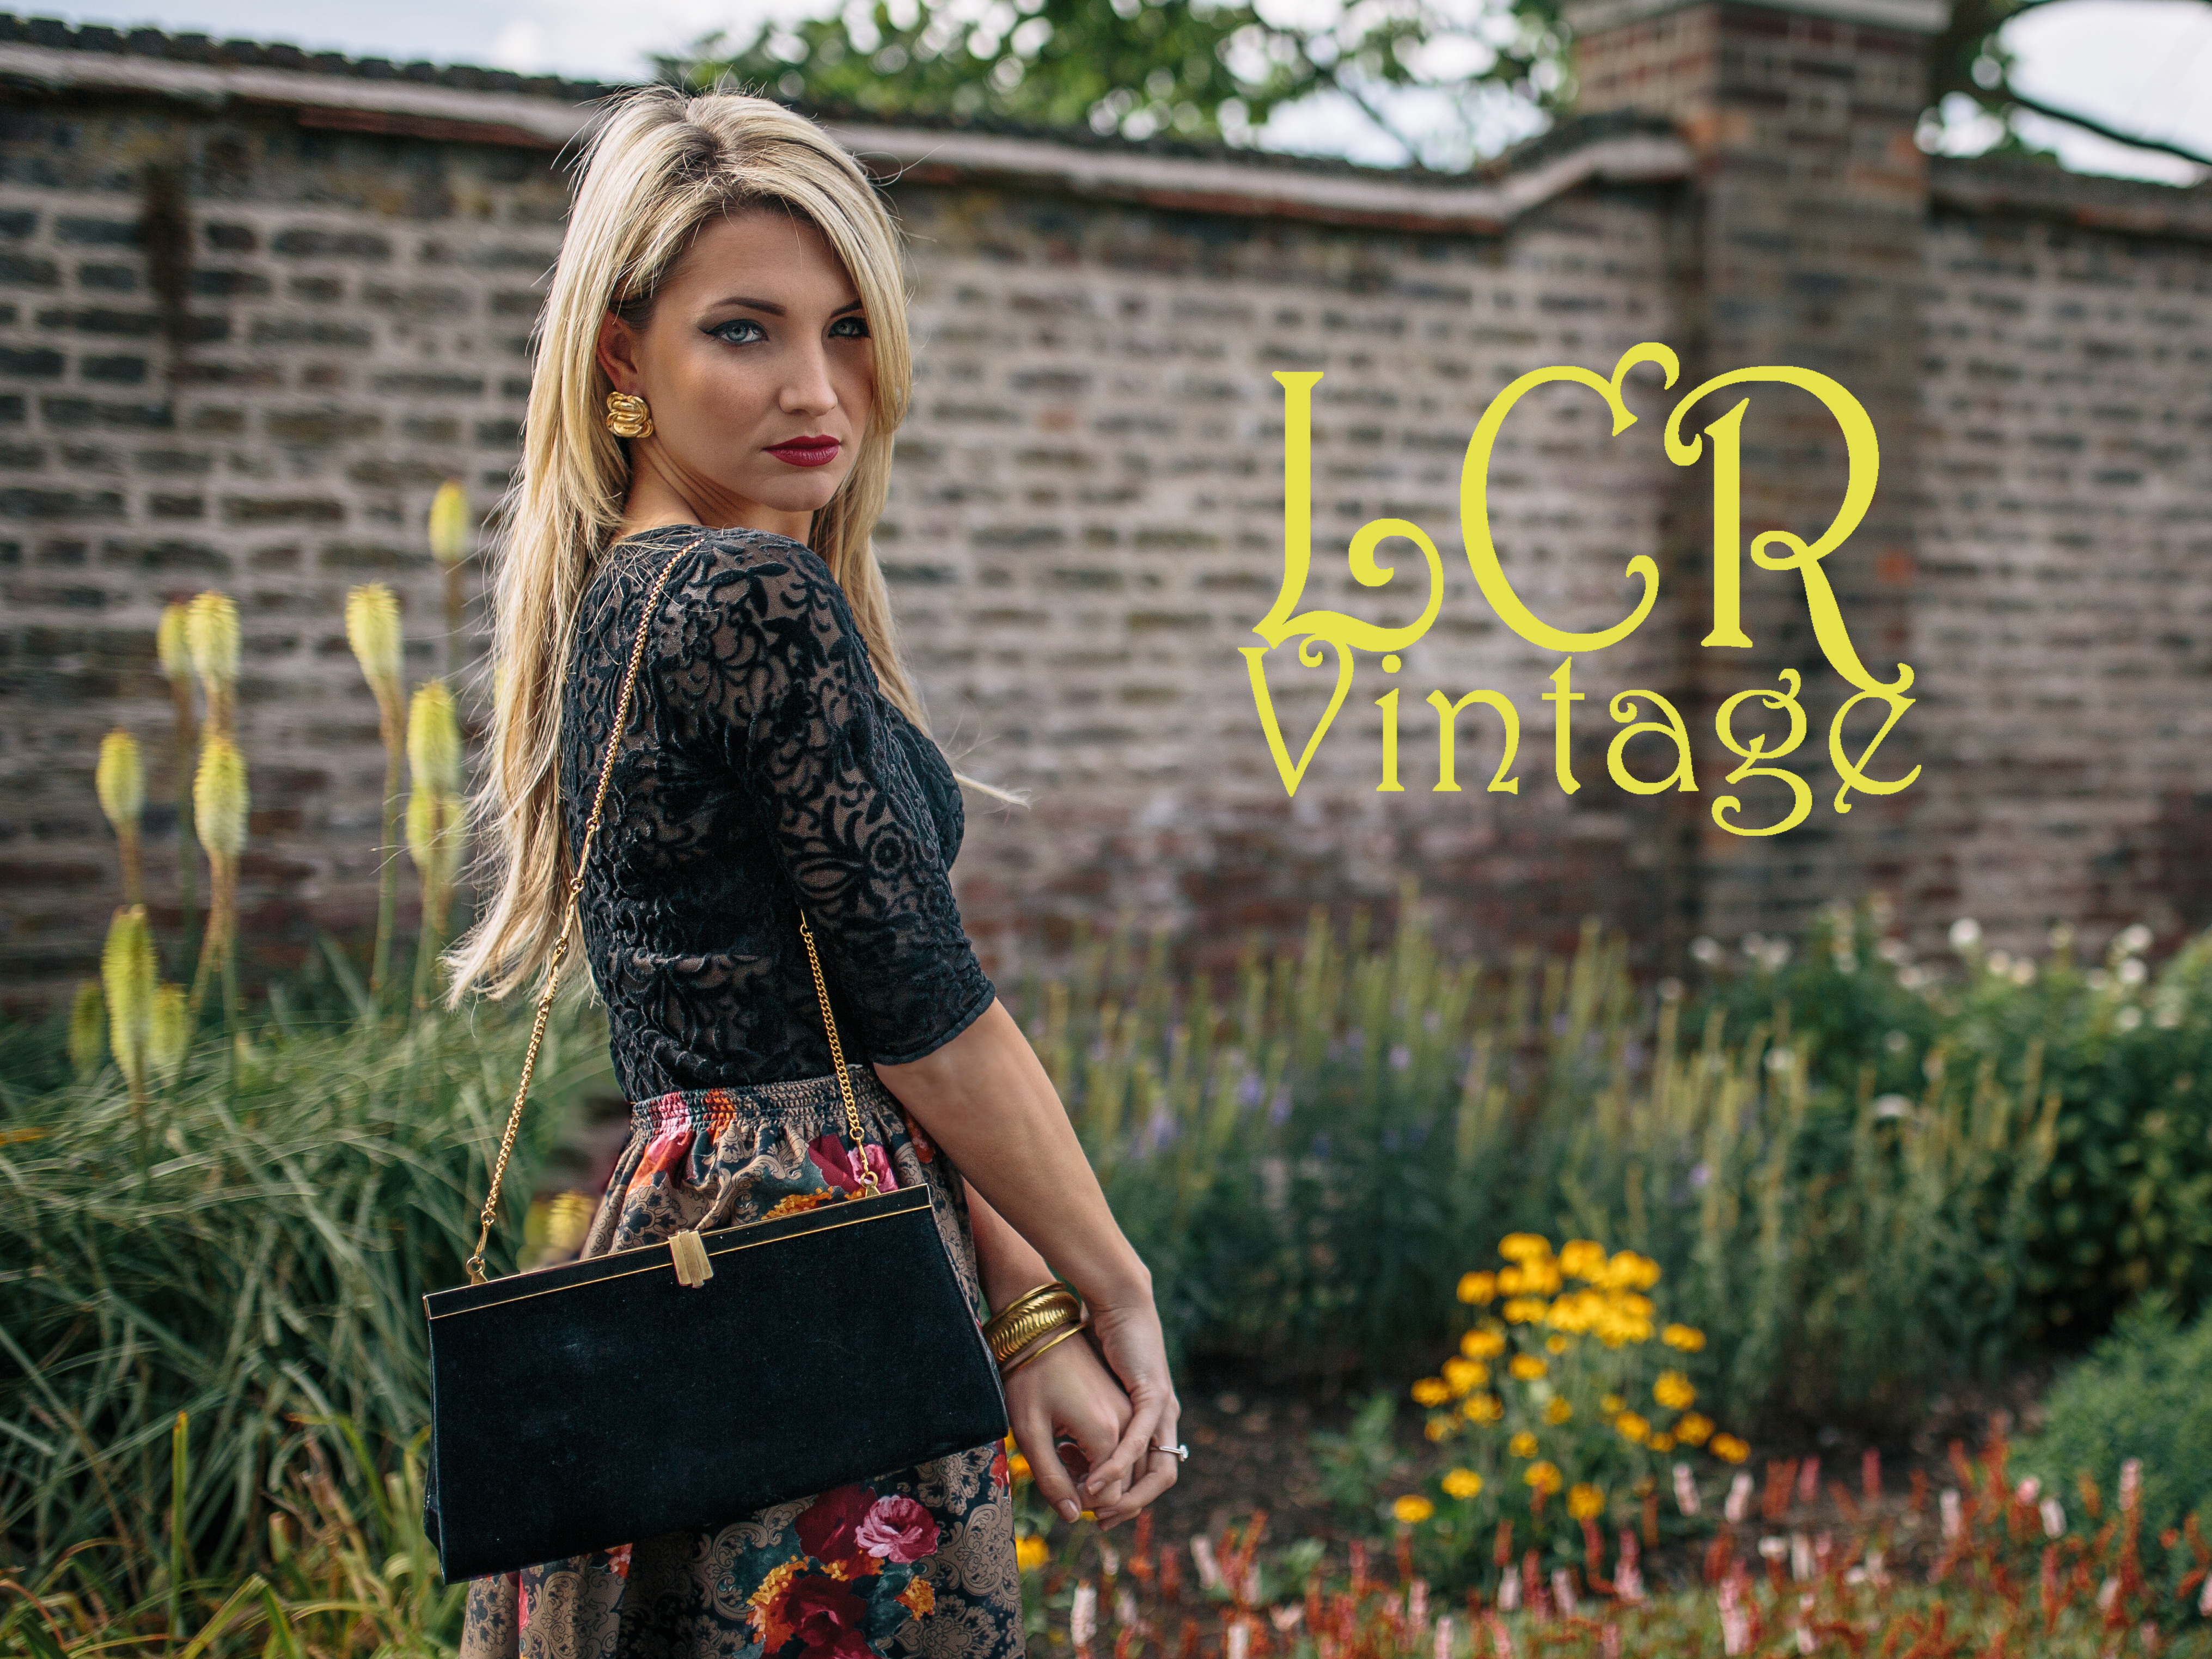 LCR Vintage photo 1.jpg